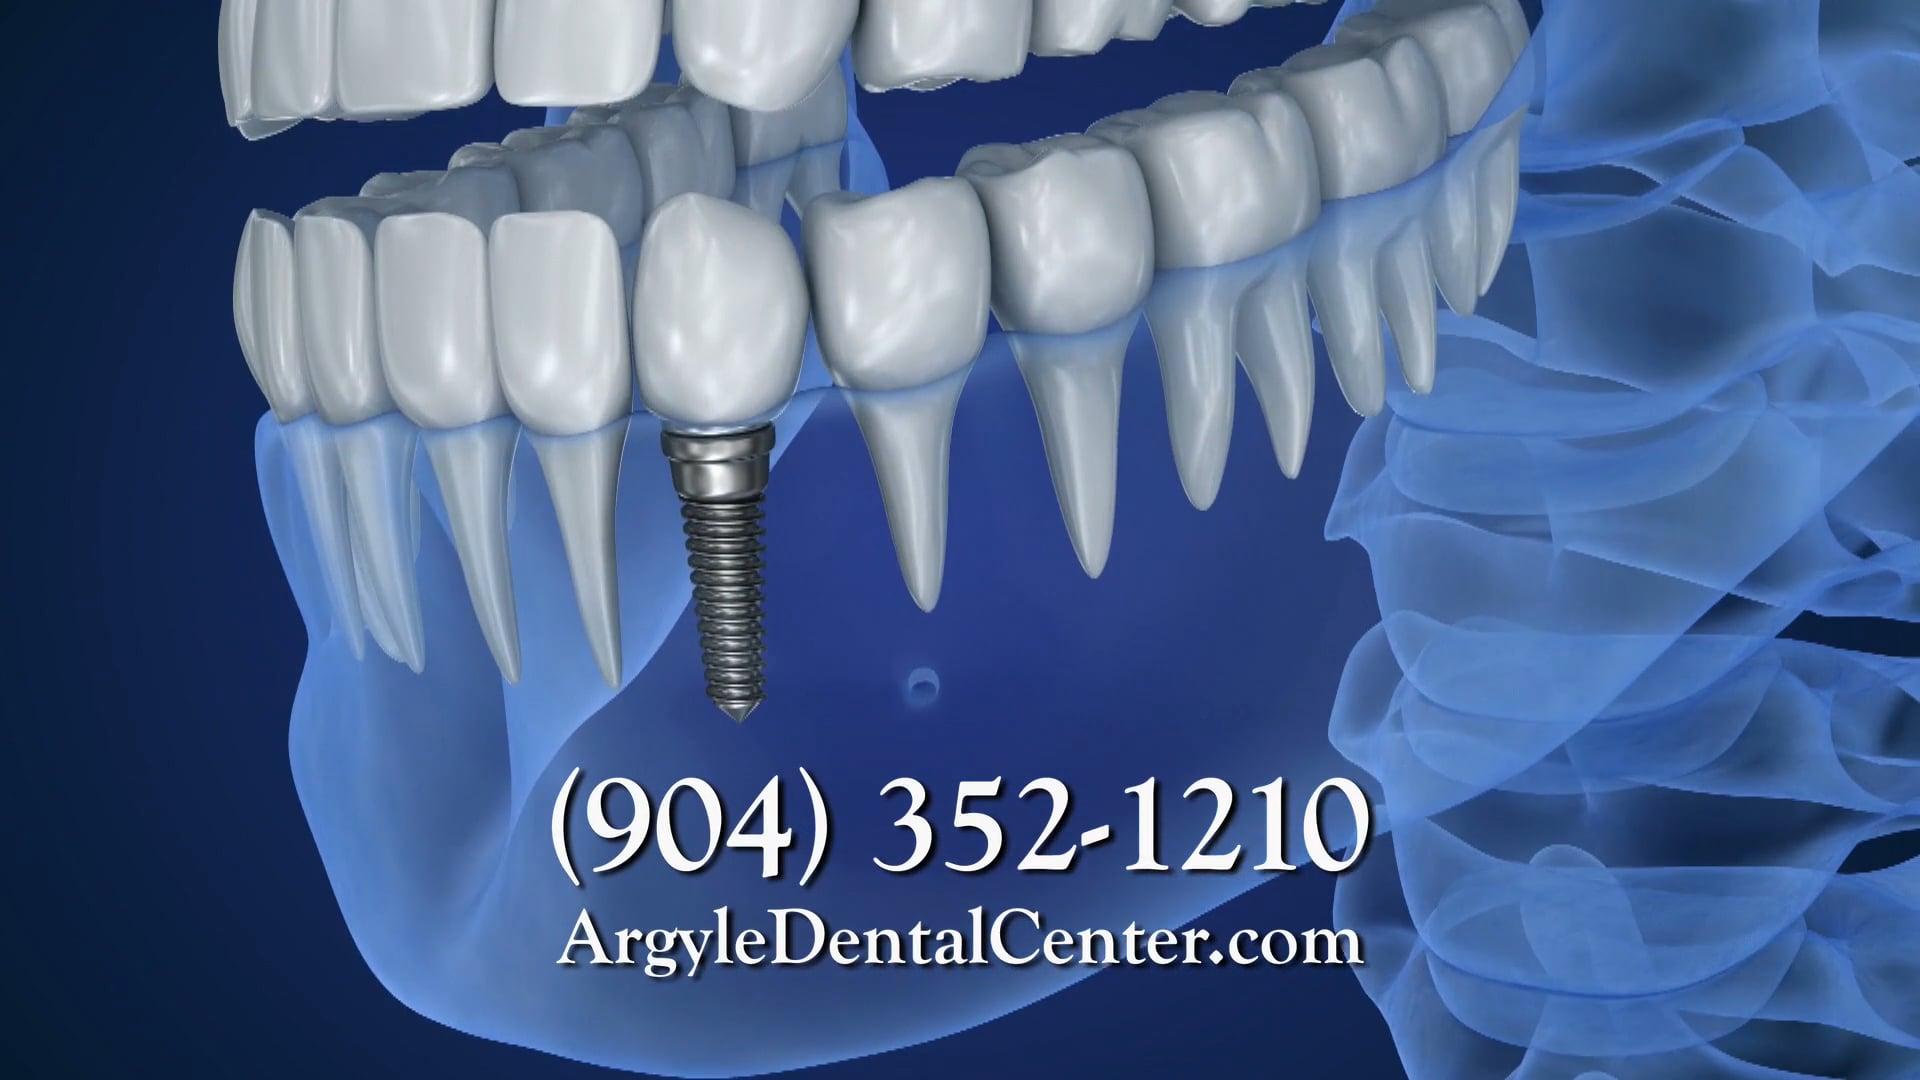 Argyle Dental Center - Implants